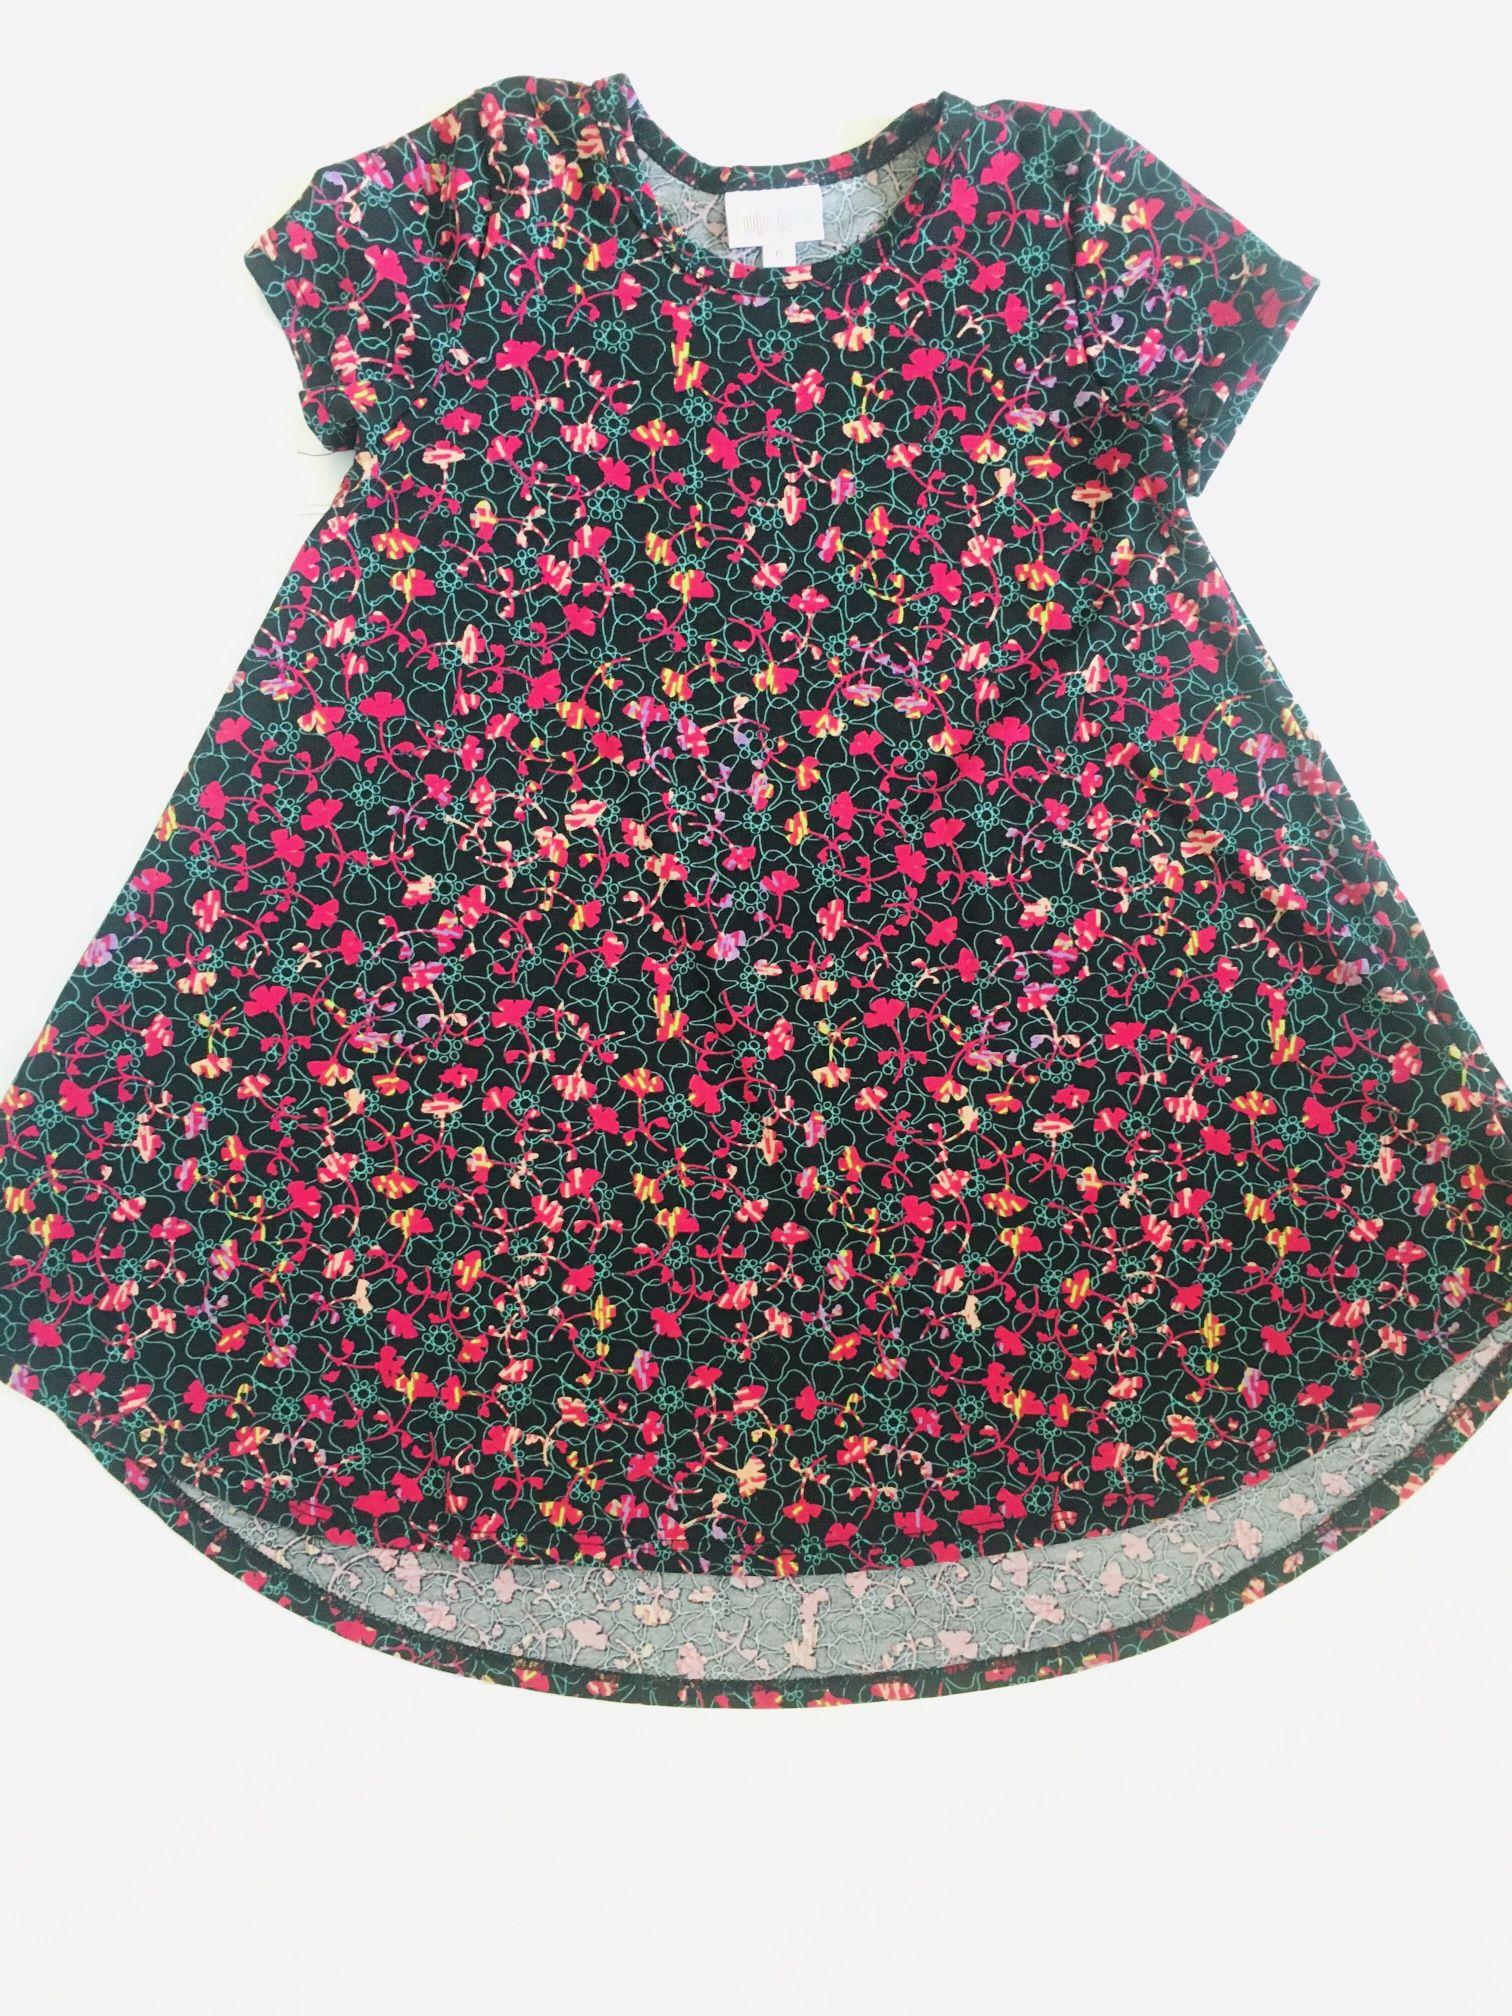 Lularoe Super Flare Dress- Girls sz 6